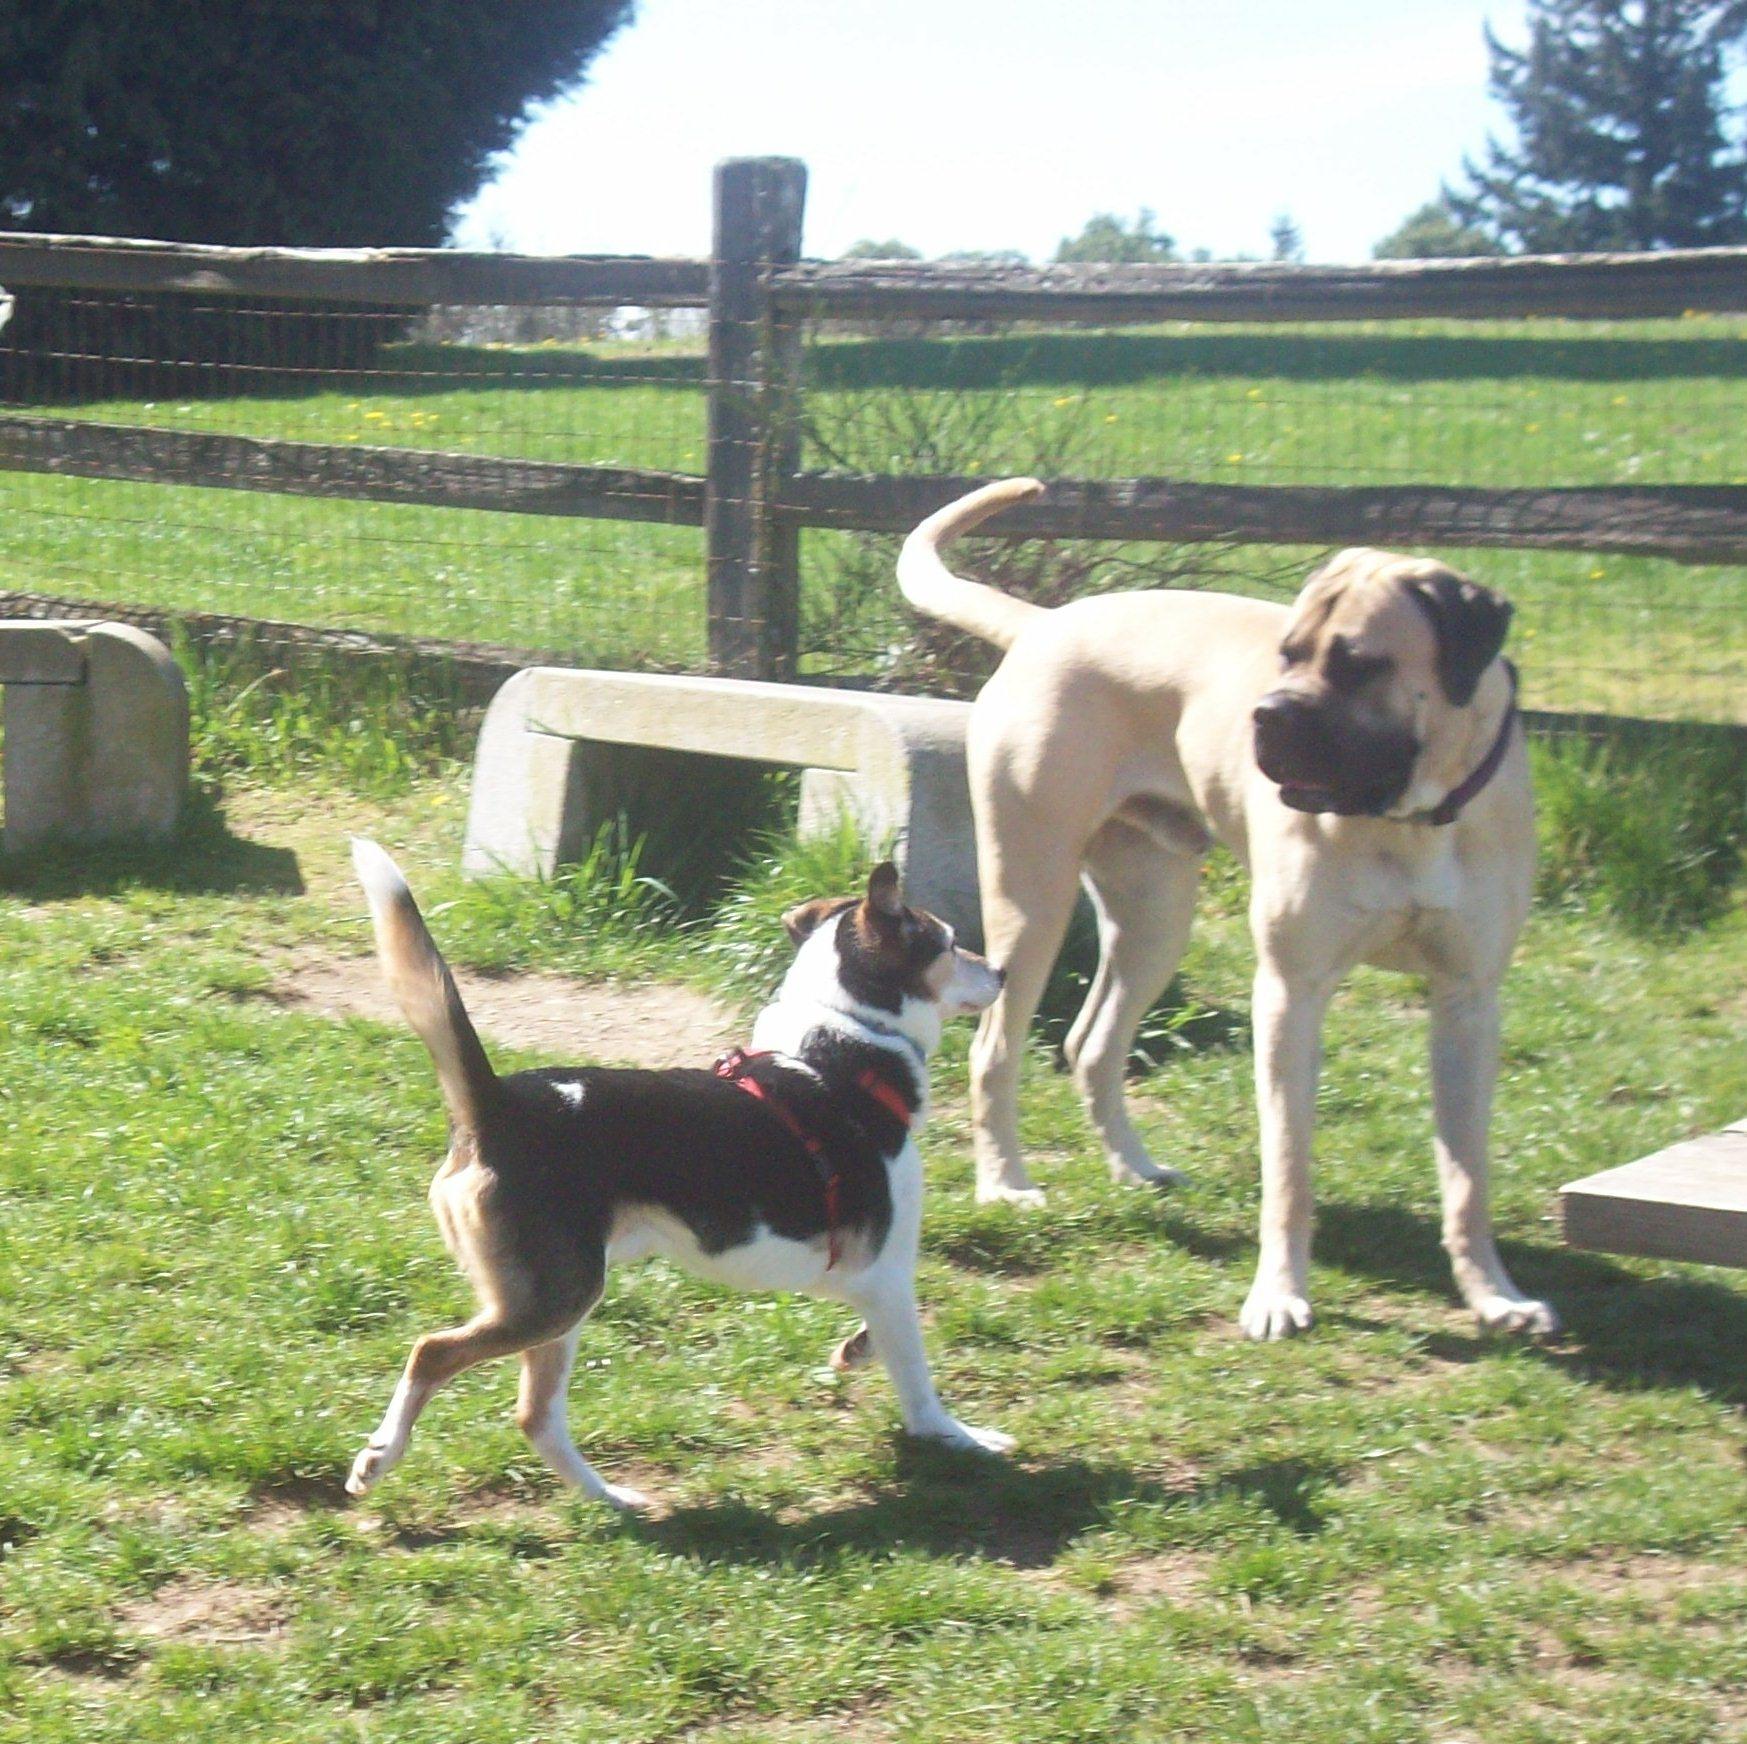 Howie meets Otis